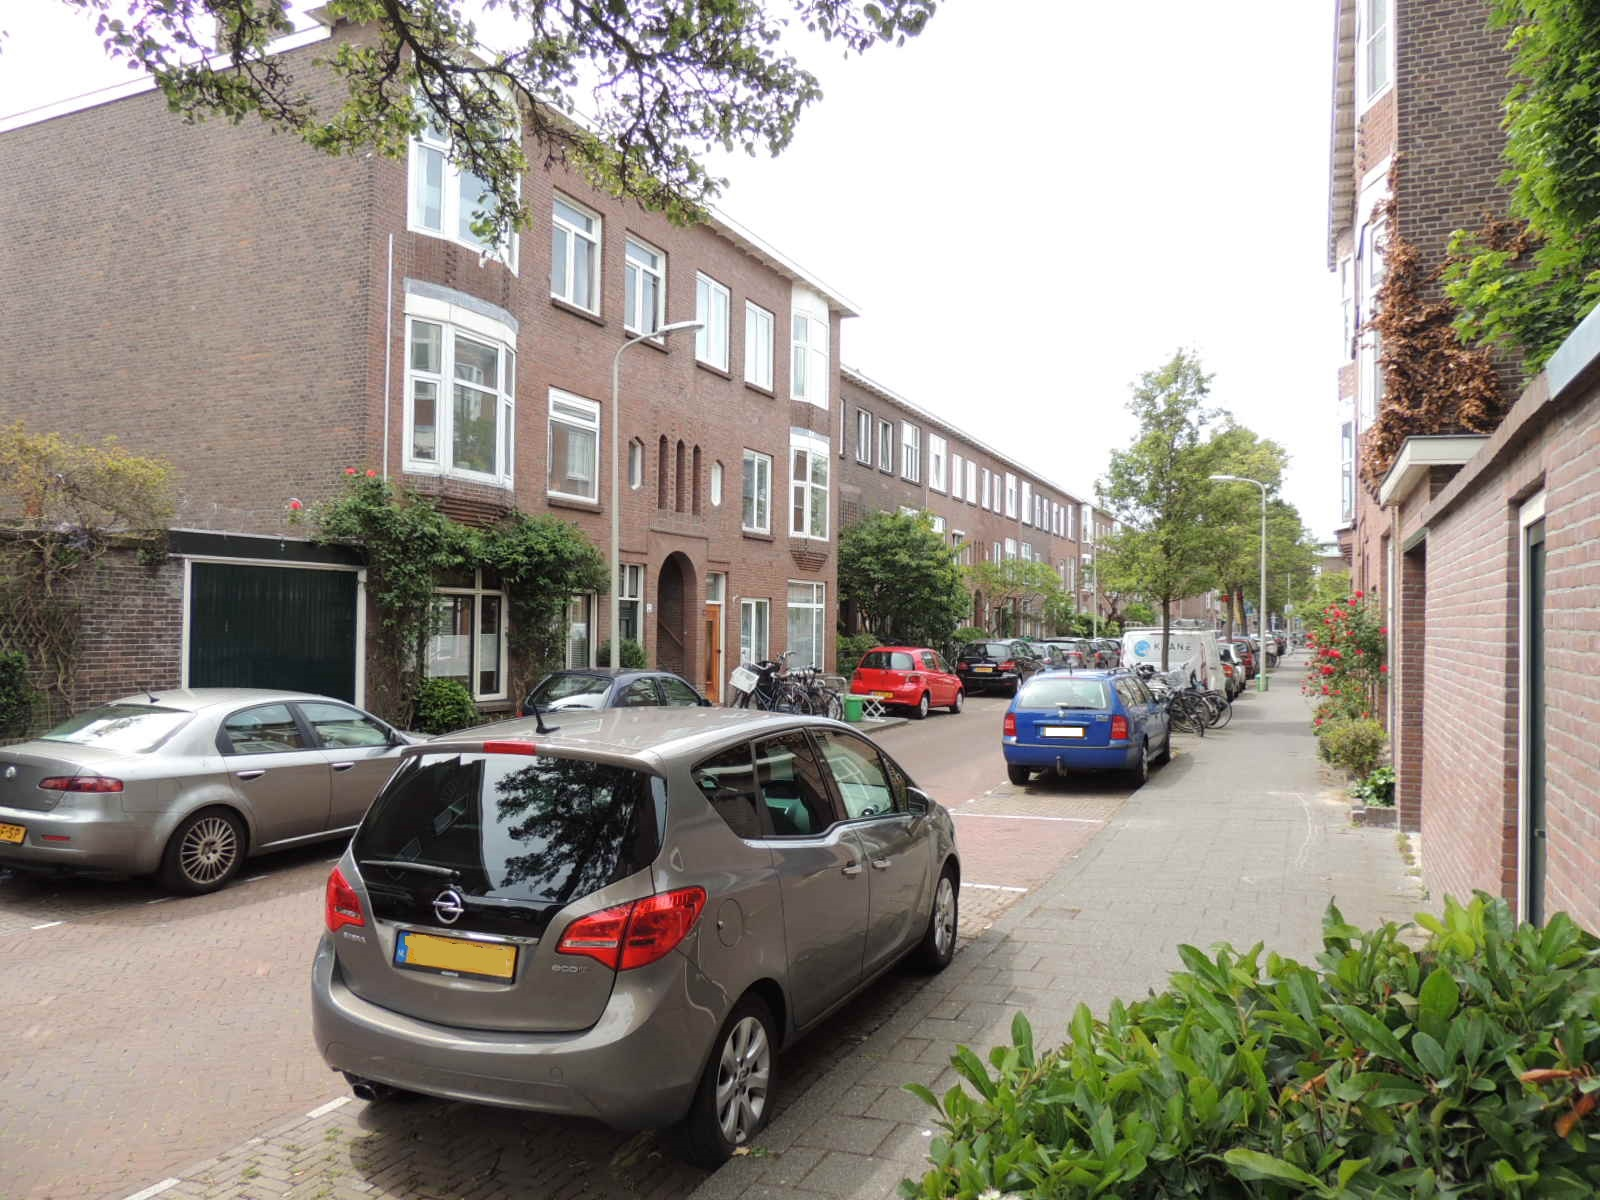 ligusterstraat, The Hague